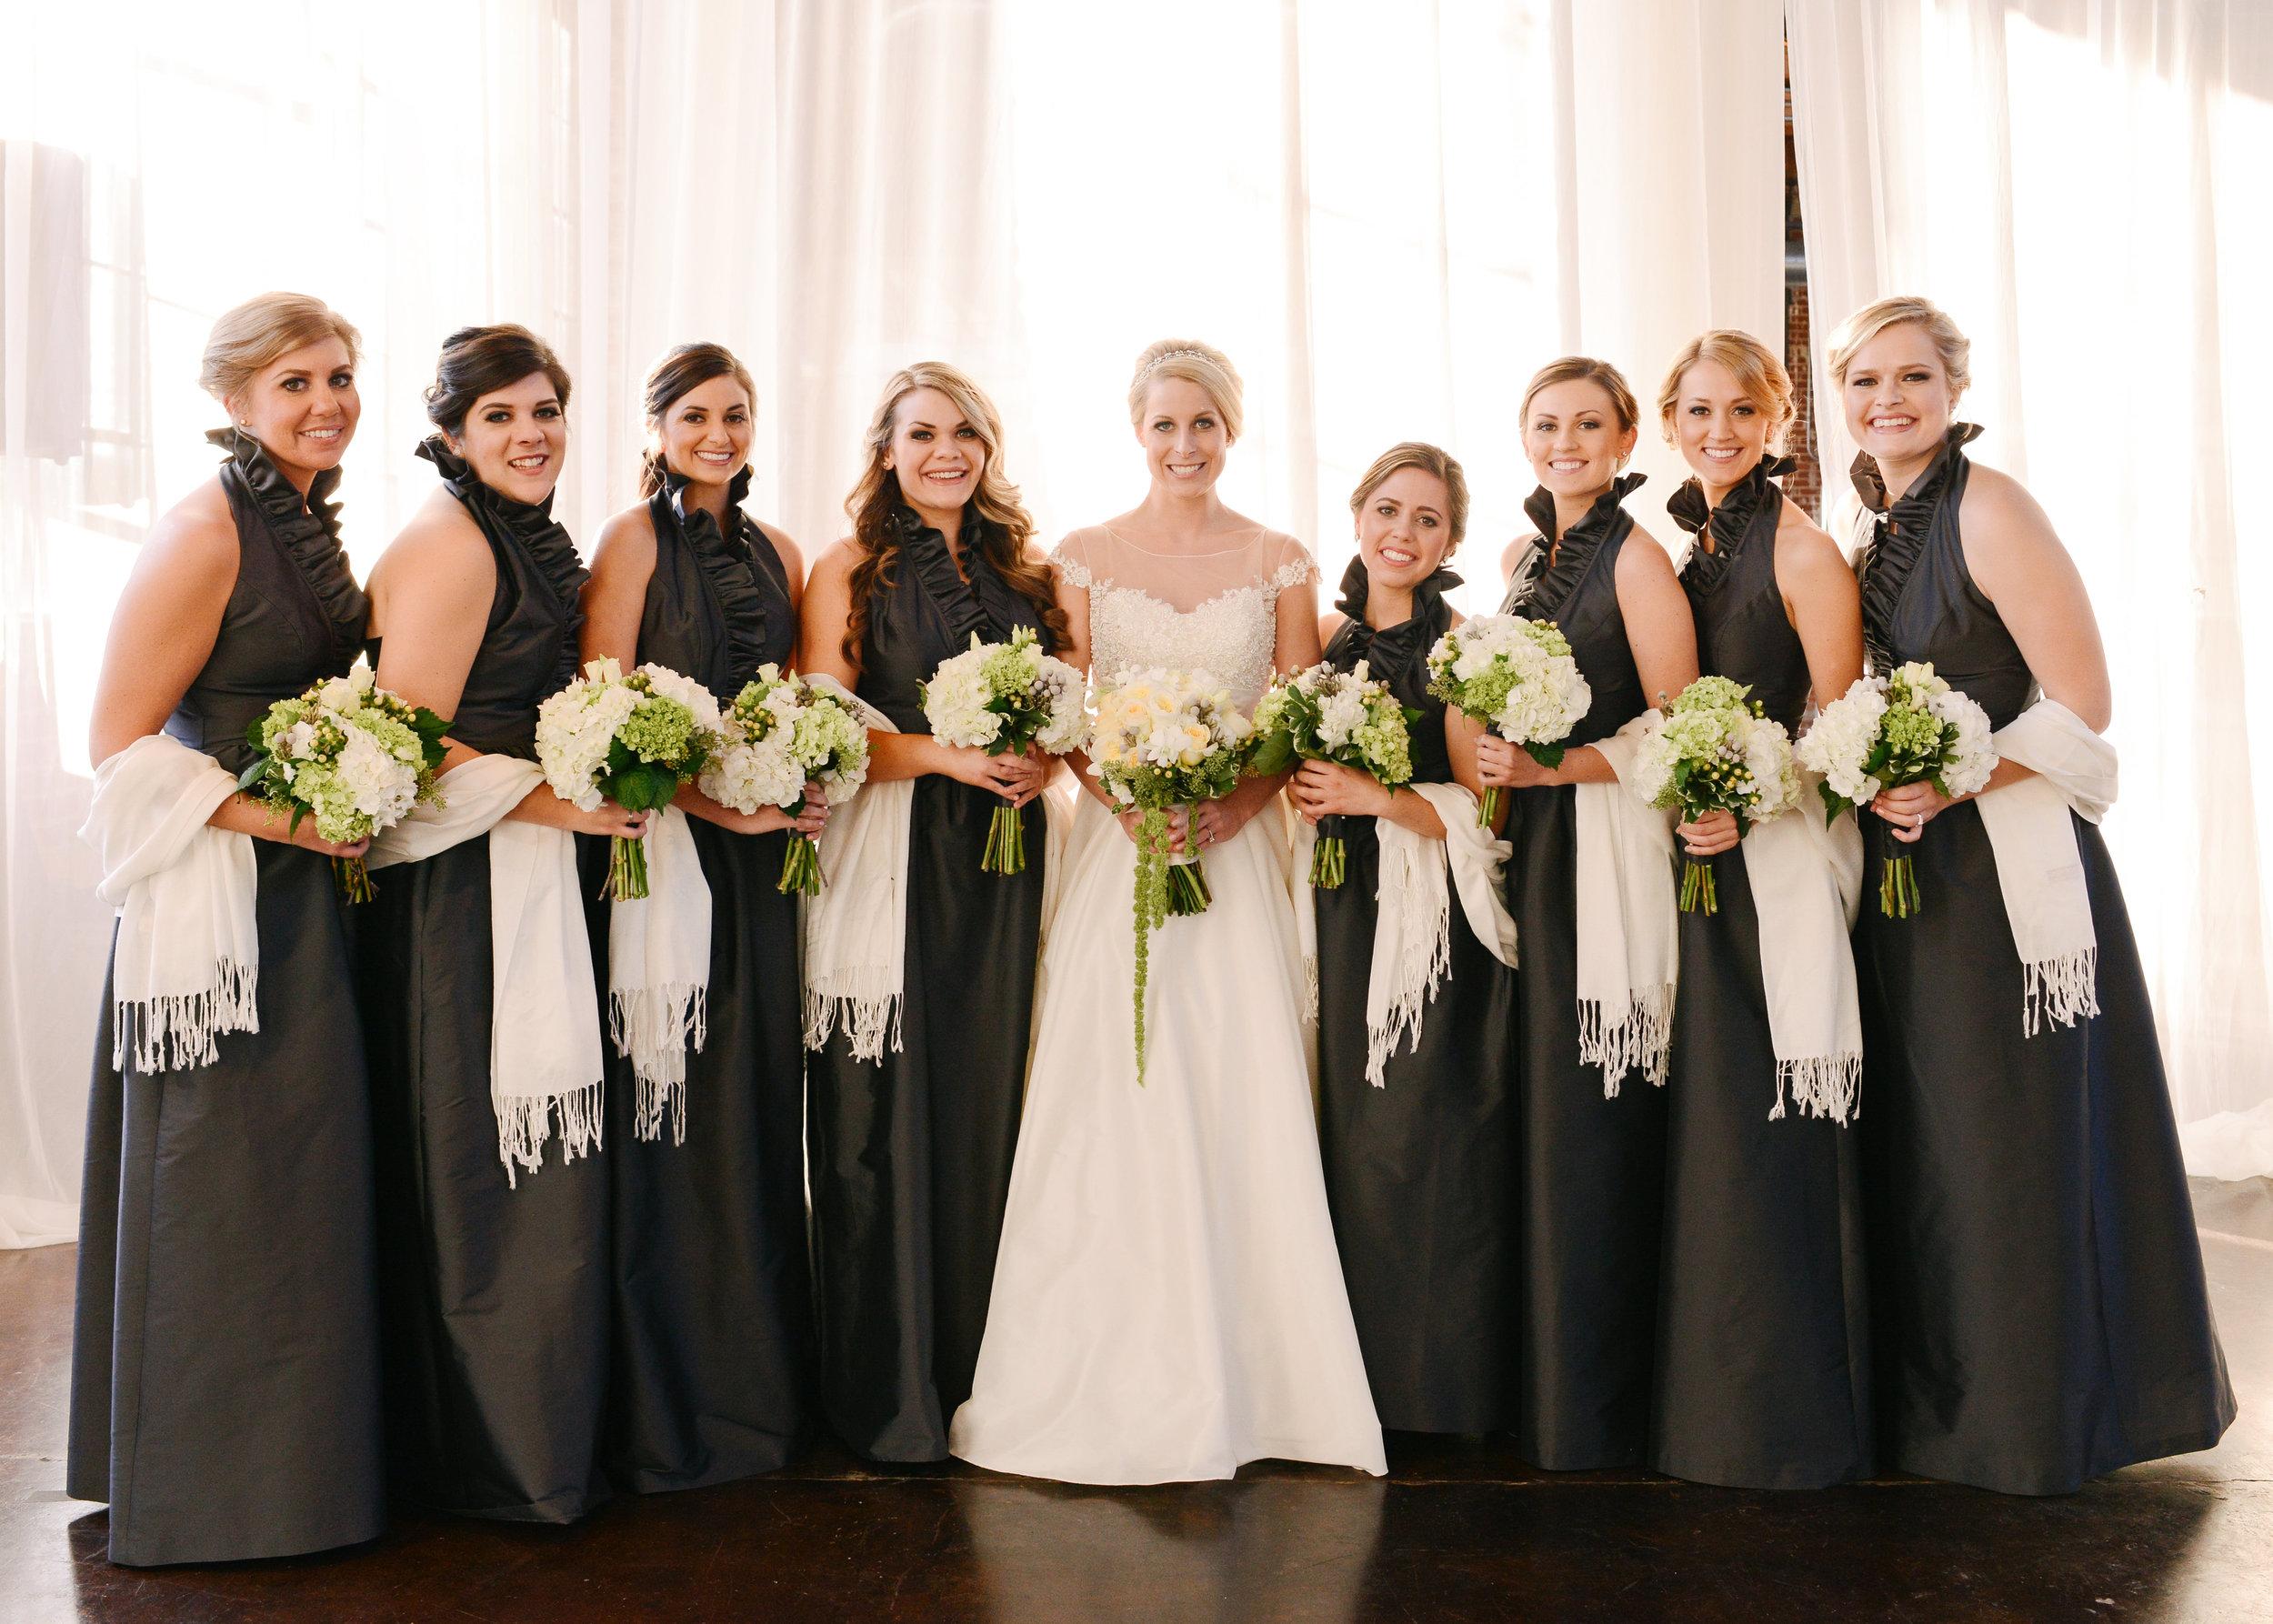 sarah-and-justin-smith-wedding-0138.jpg